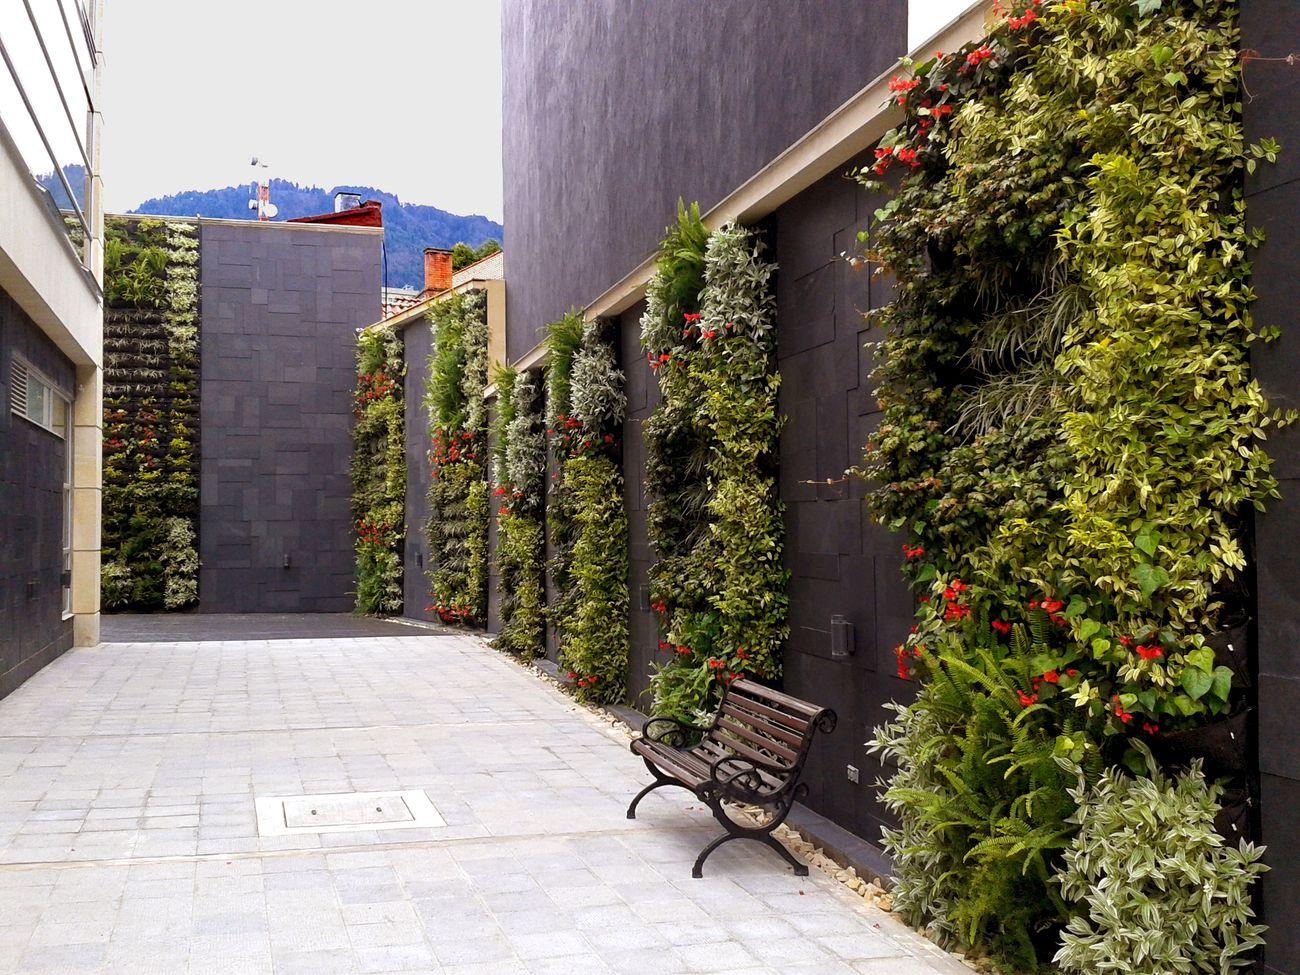 Jardines Verticales Bogot y Colombia  Vertn